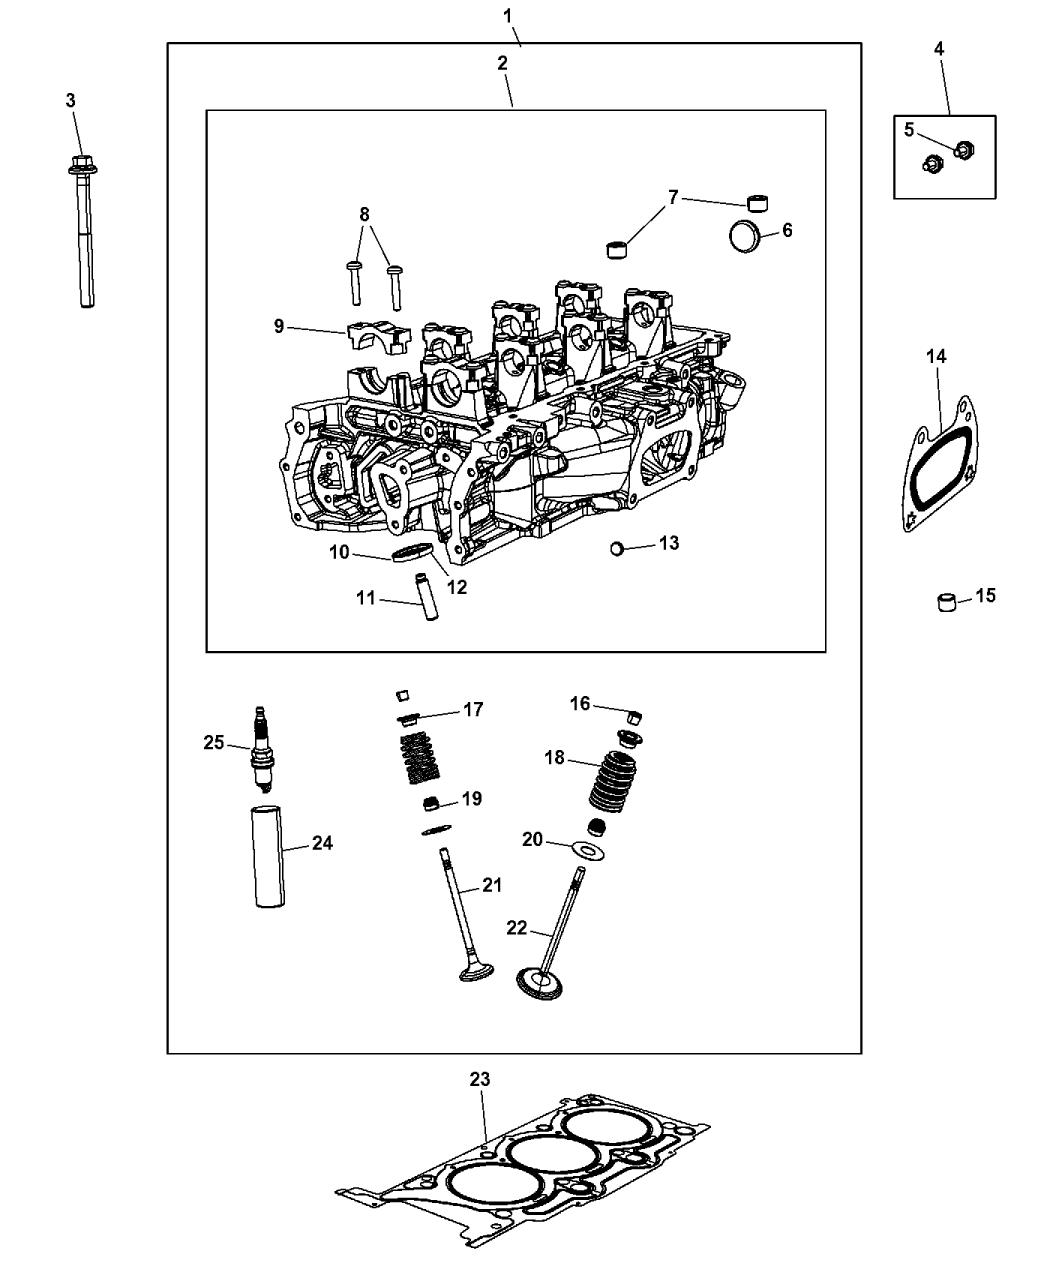 sp149125ae genuine jeep spark plug. Black Bedroom Furniture Sets. Home Design Ideas